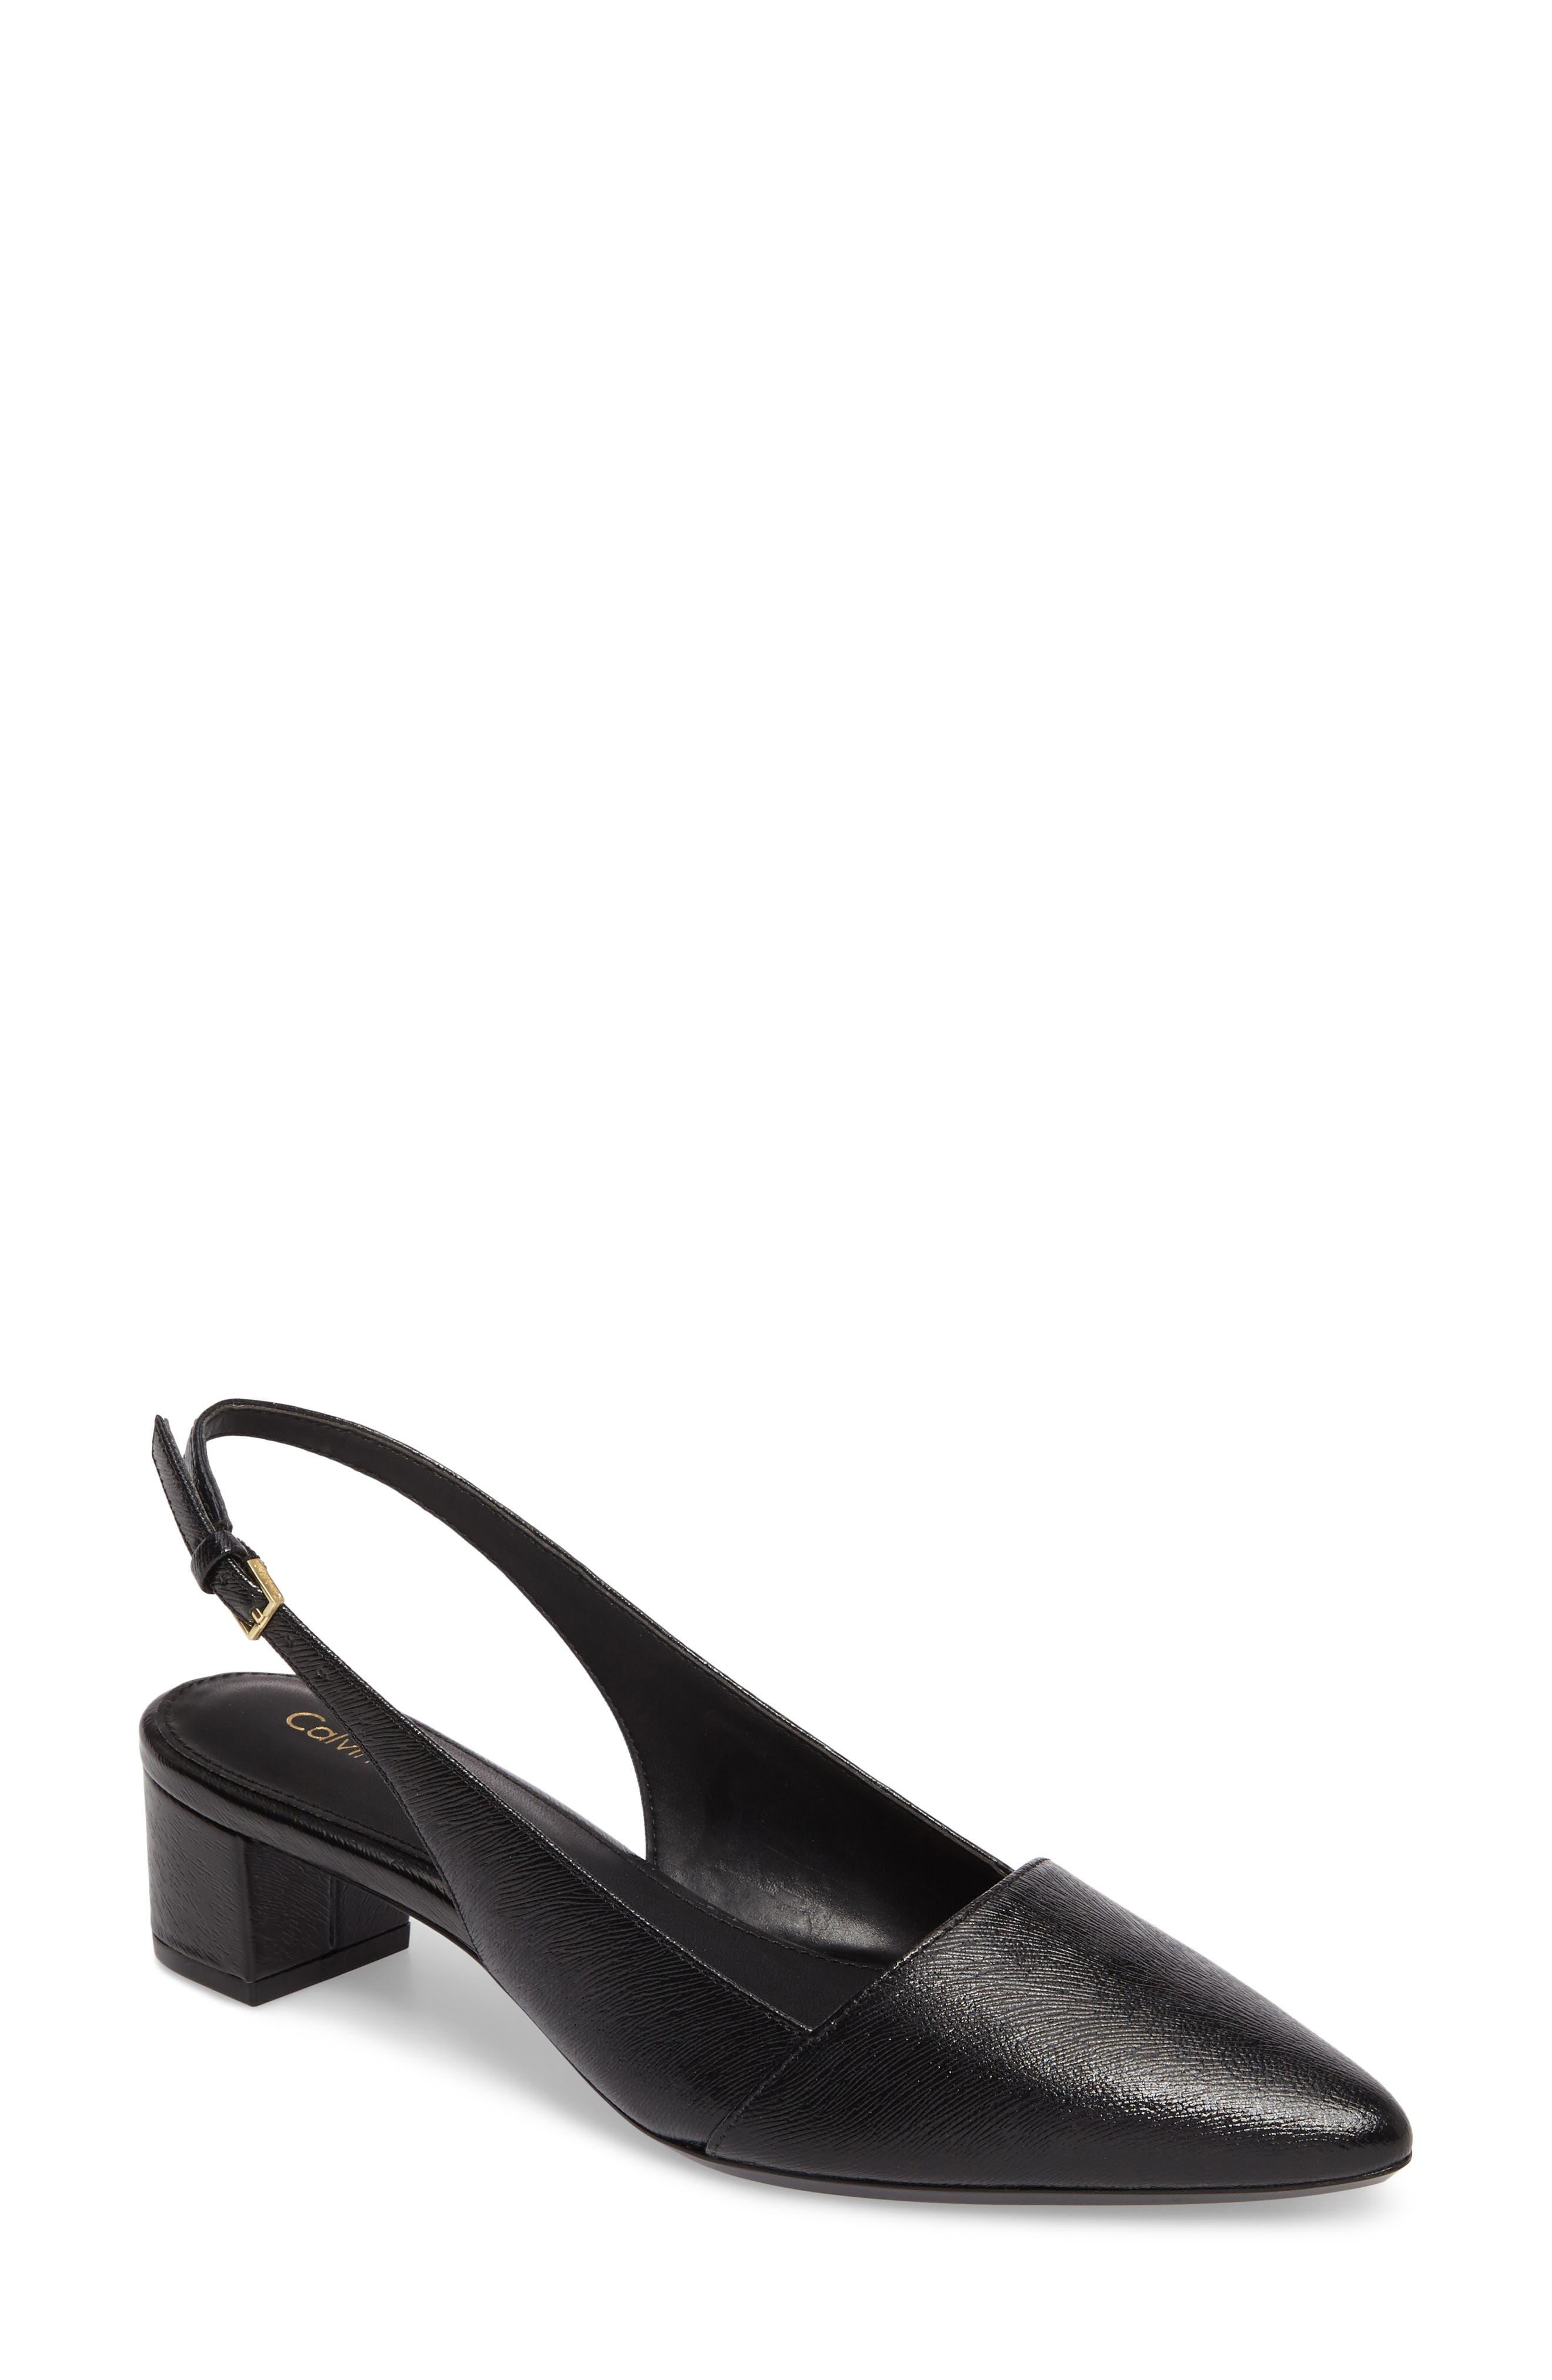 Galinda Slingback Pump,                         Main,                         color, Black Leather